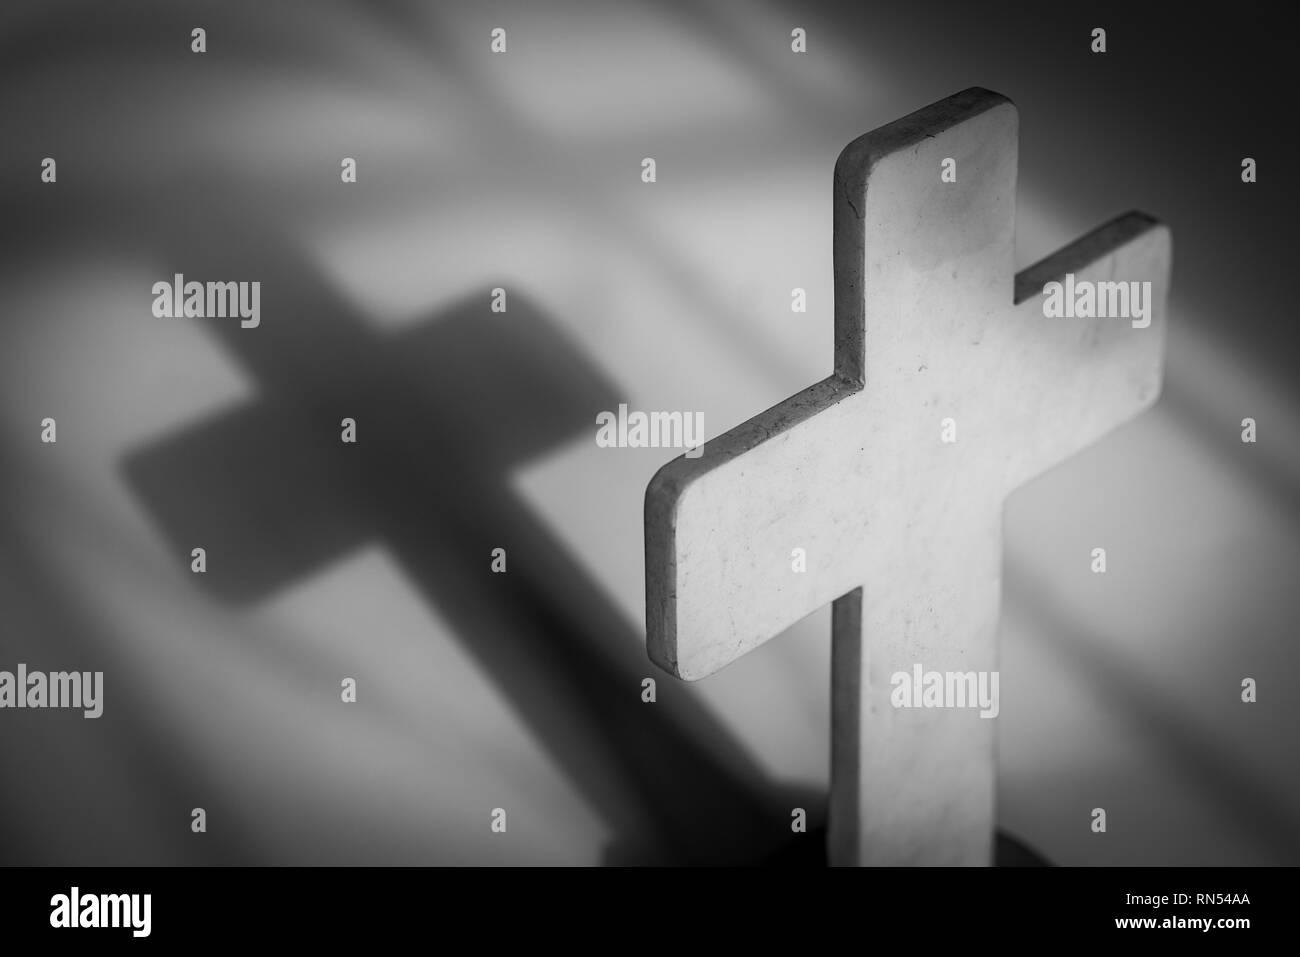 Light on the cross and cast a shadow: symbol of the Christian faith - Stock Image